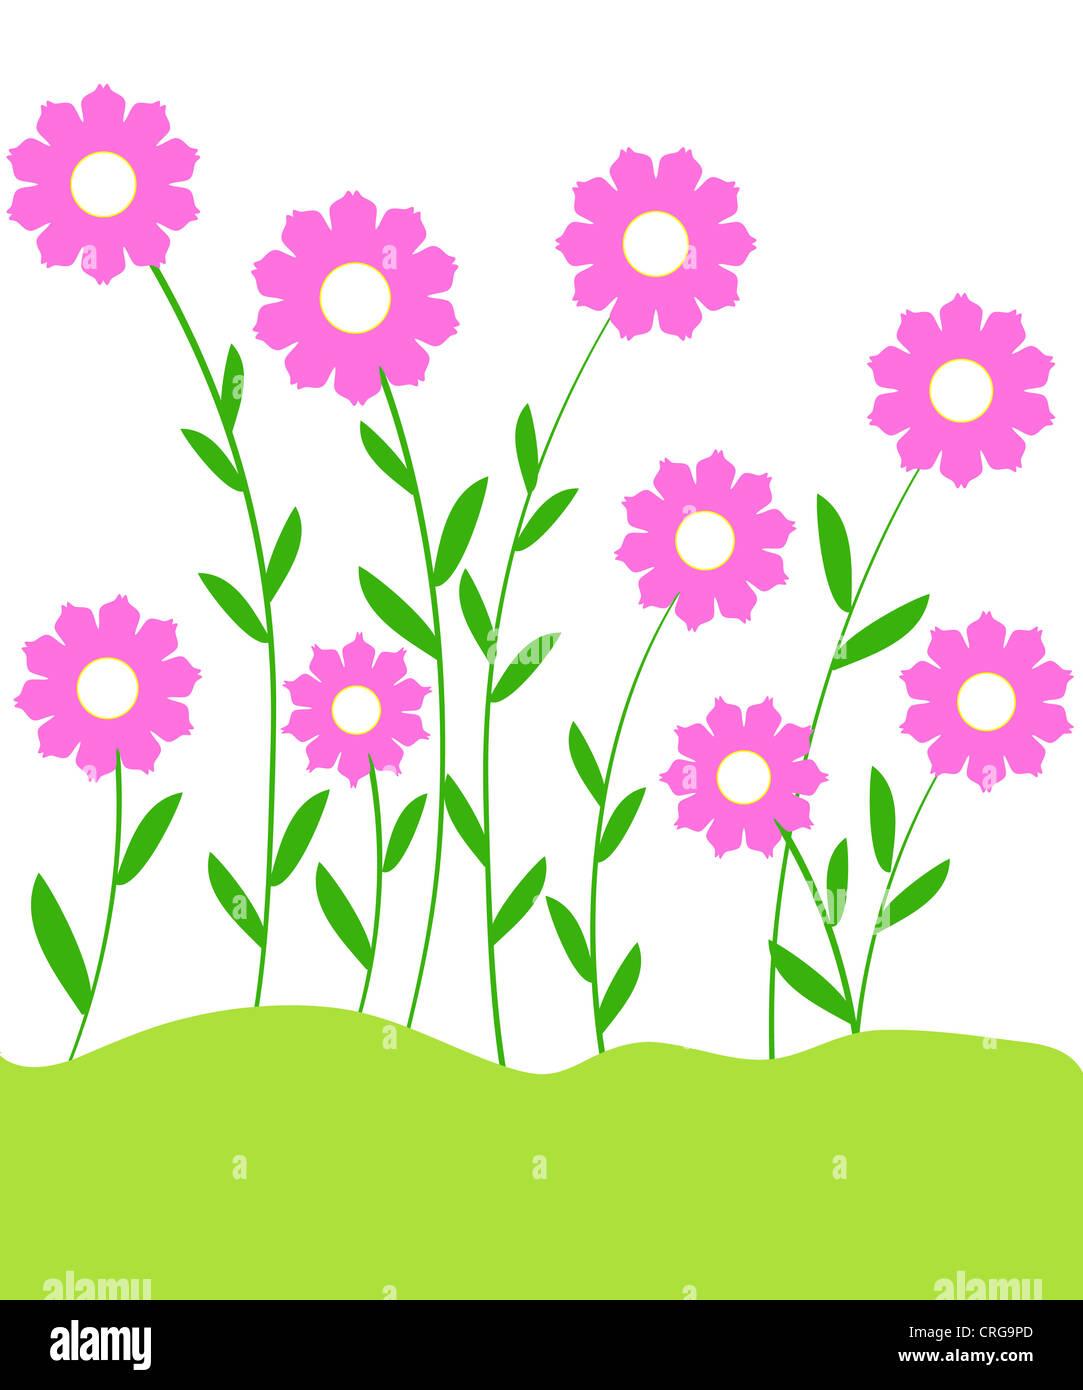 Pink flowering plants illustration Stock Photo